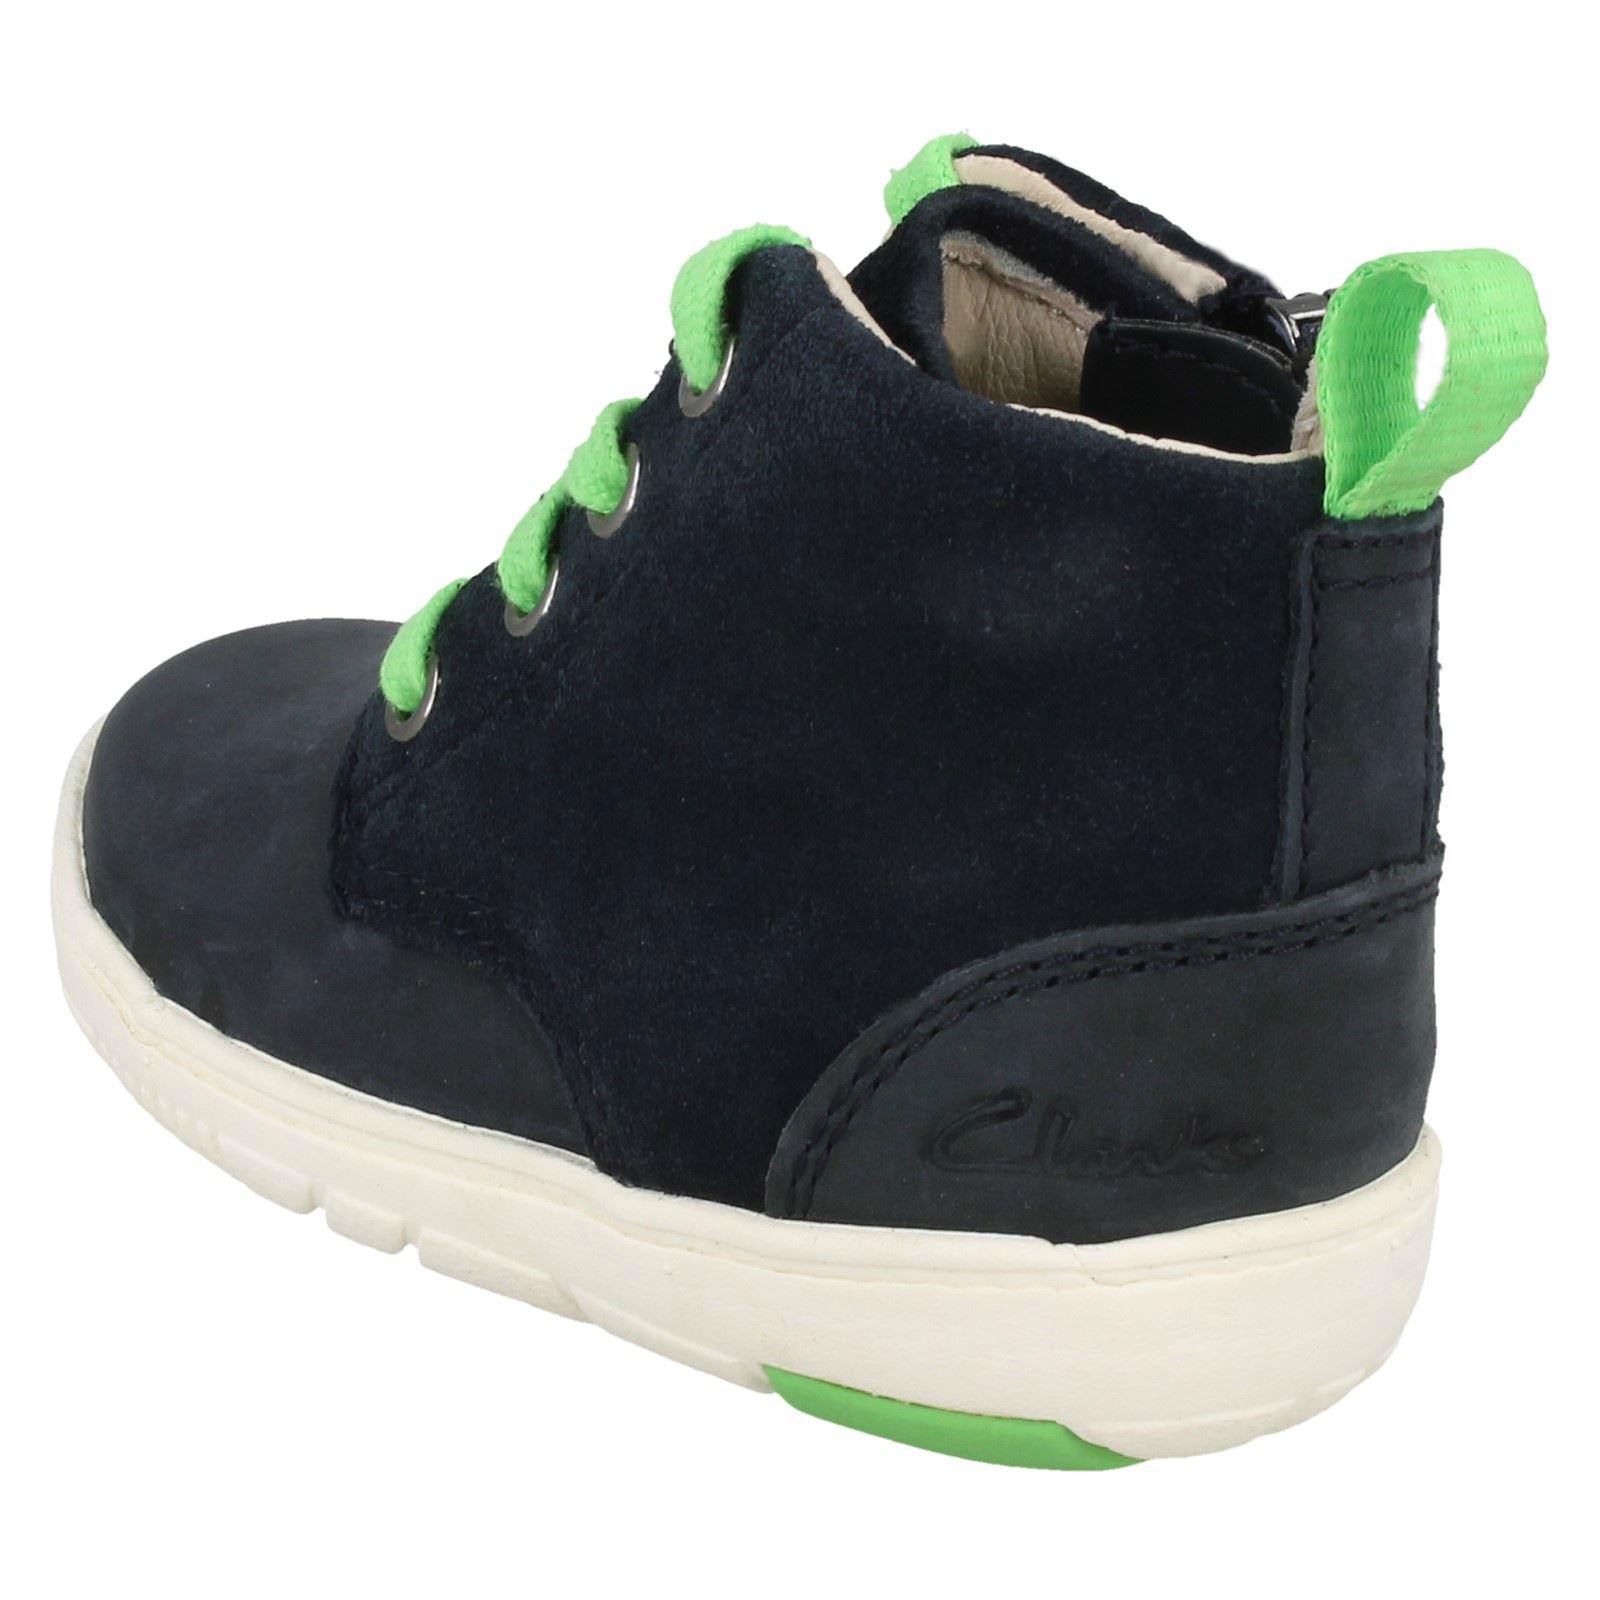 c4f4eb25b67 Boys-Clarks-Ankle-Boots-Maxi-Hehe thumbnail 13